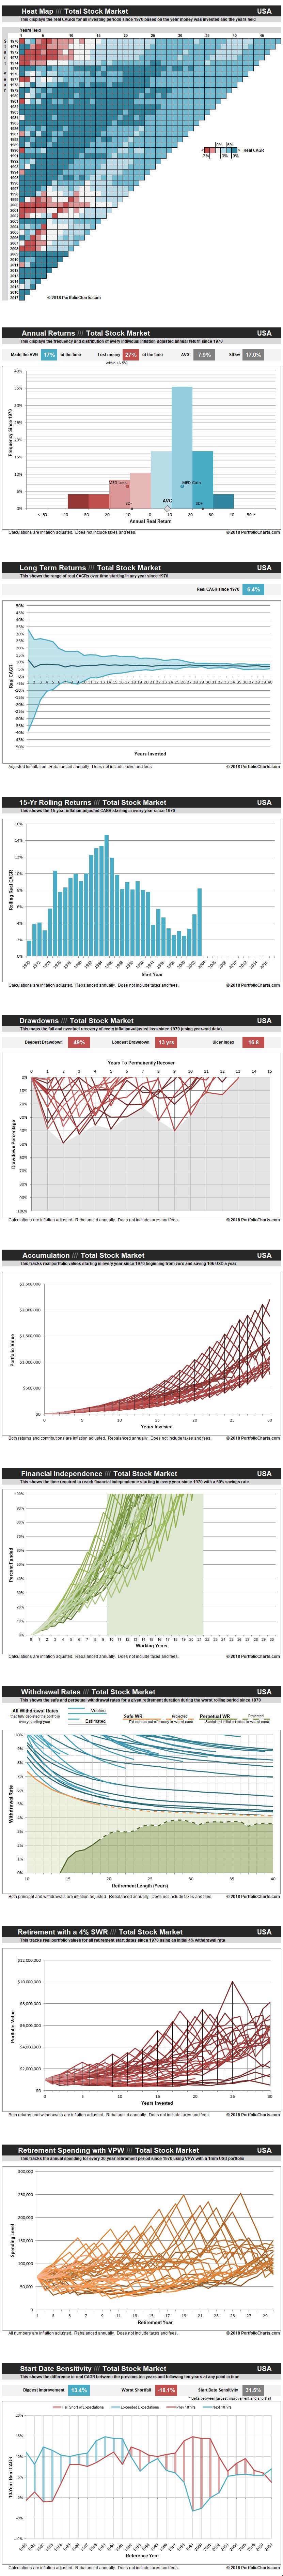 Total-Stock-Market-USA-20180129